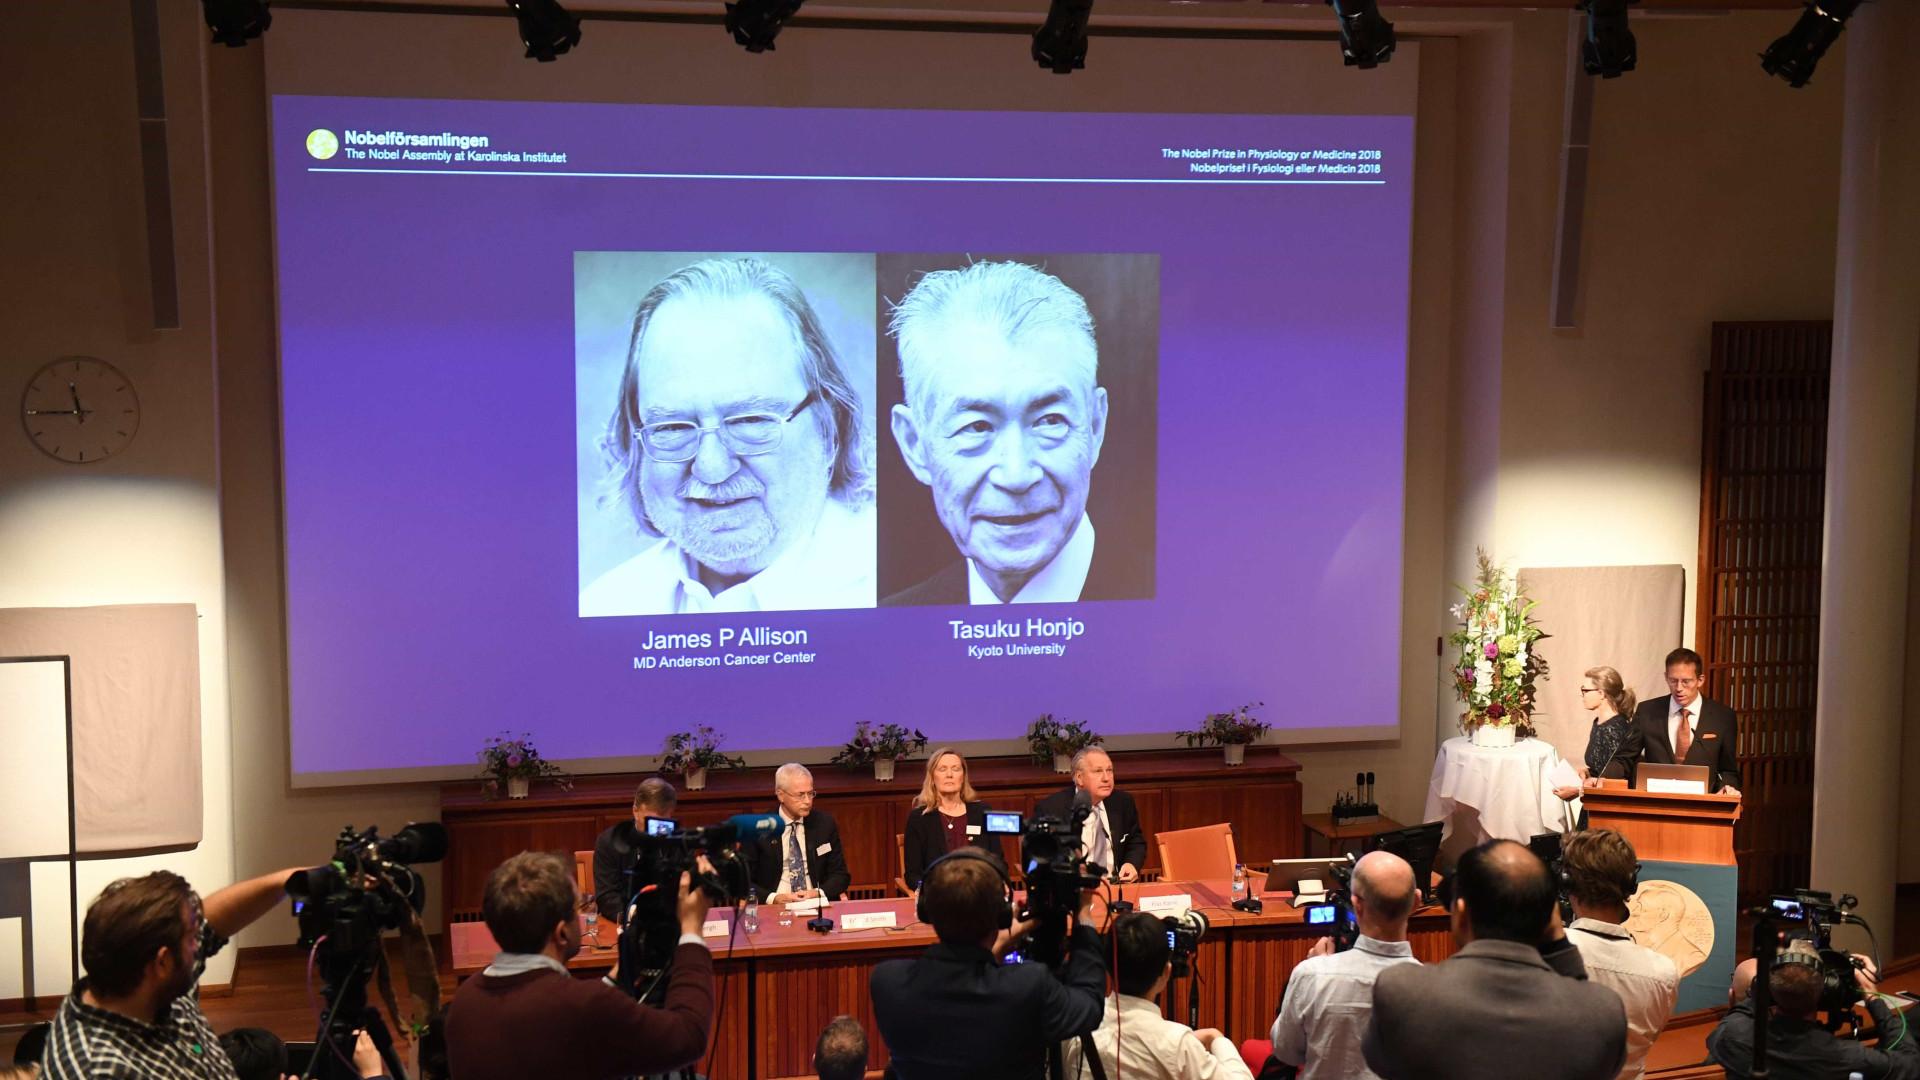 Terapia contra o câncer vence Nobel de Medicina de 2018